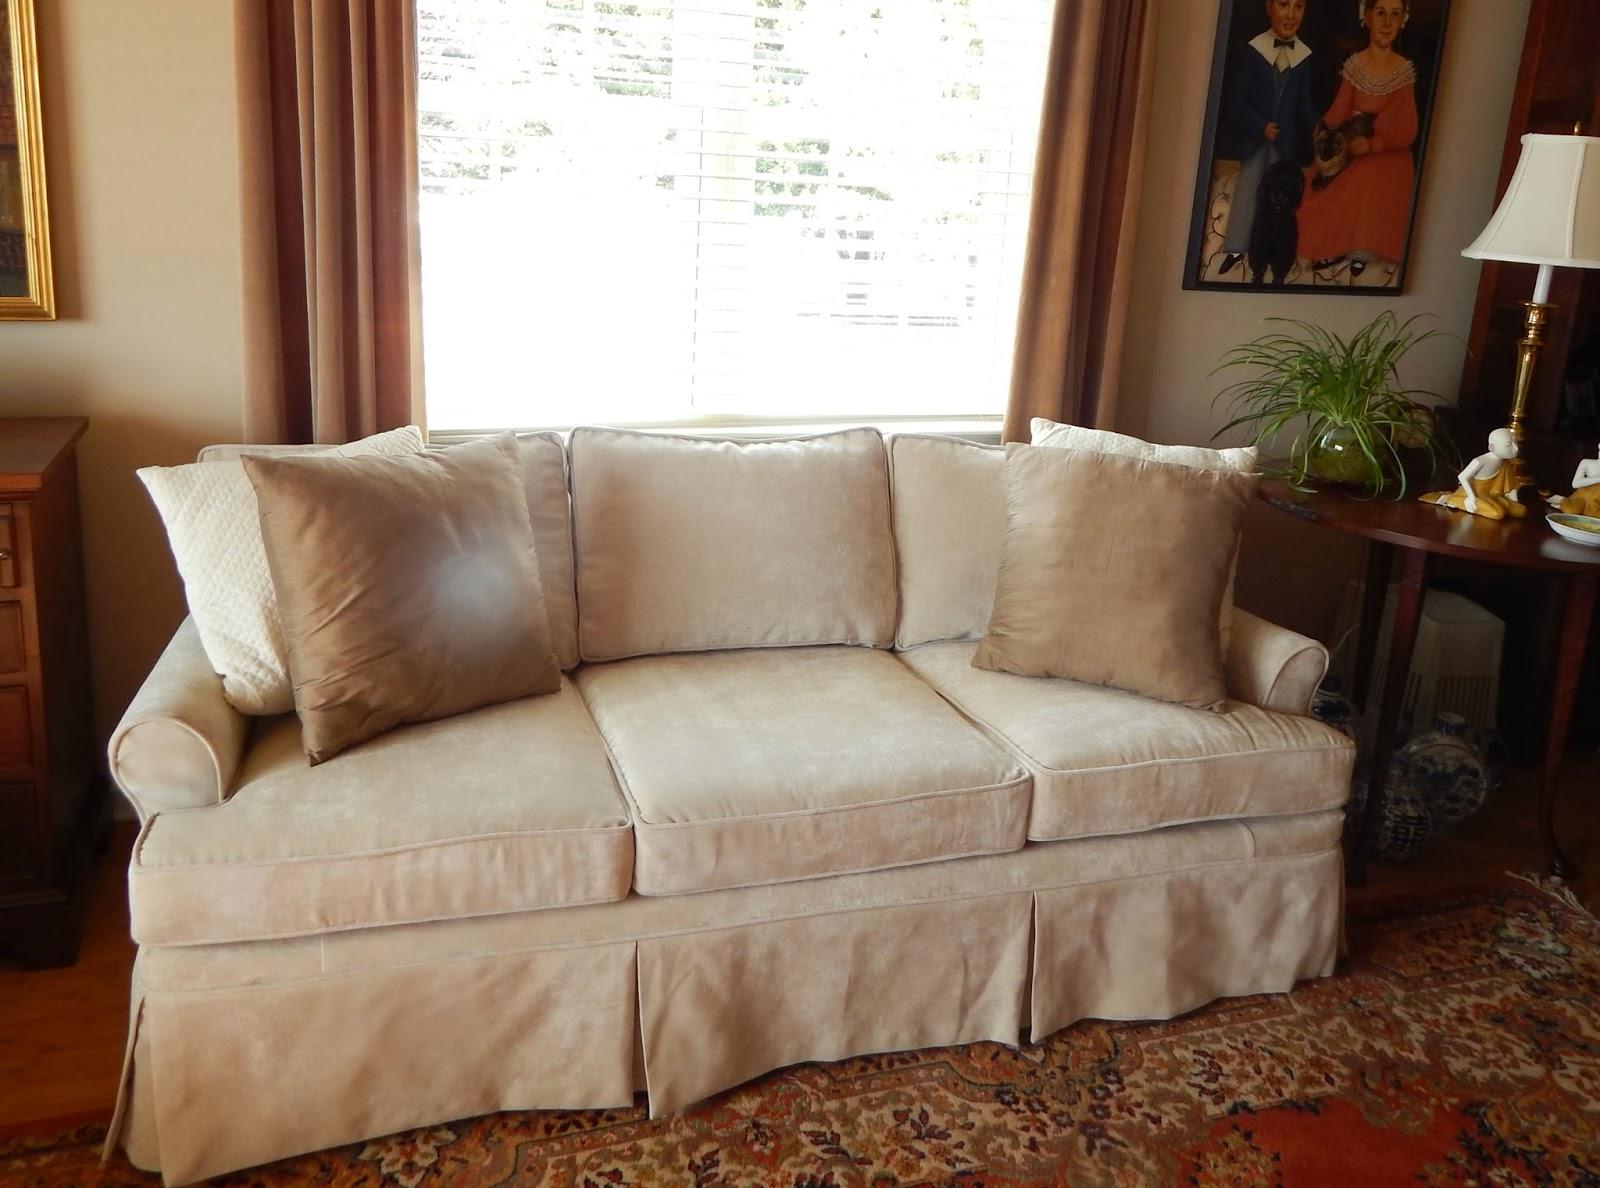 How To Make Sofa Covers Behind The Tables Pam Morris Sews: Velvet Slipcover